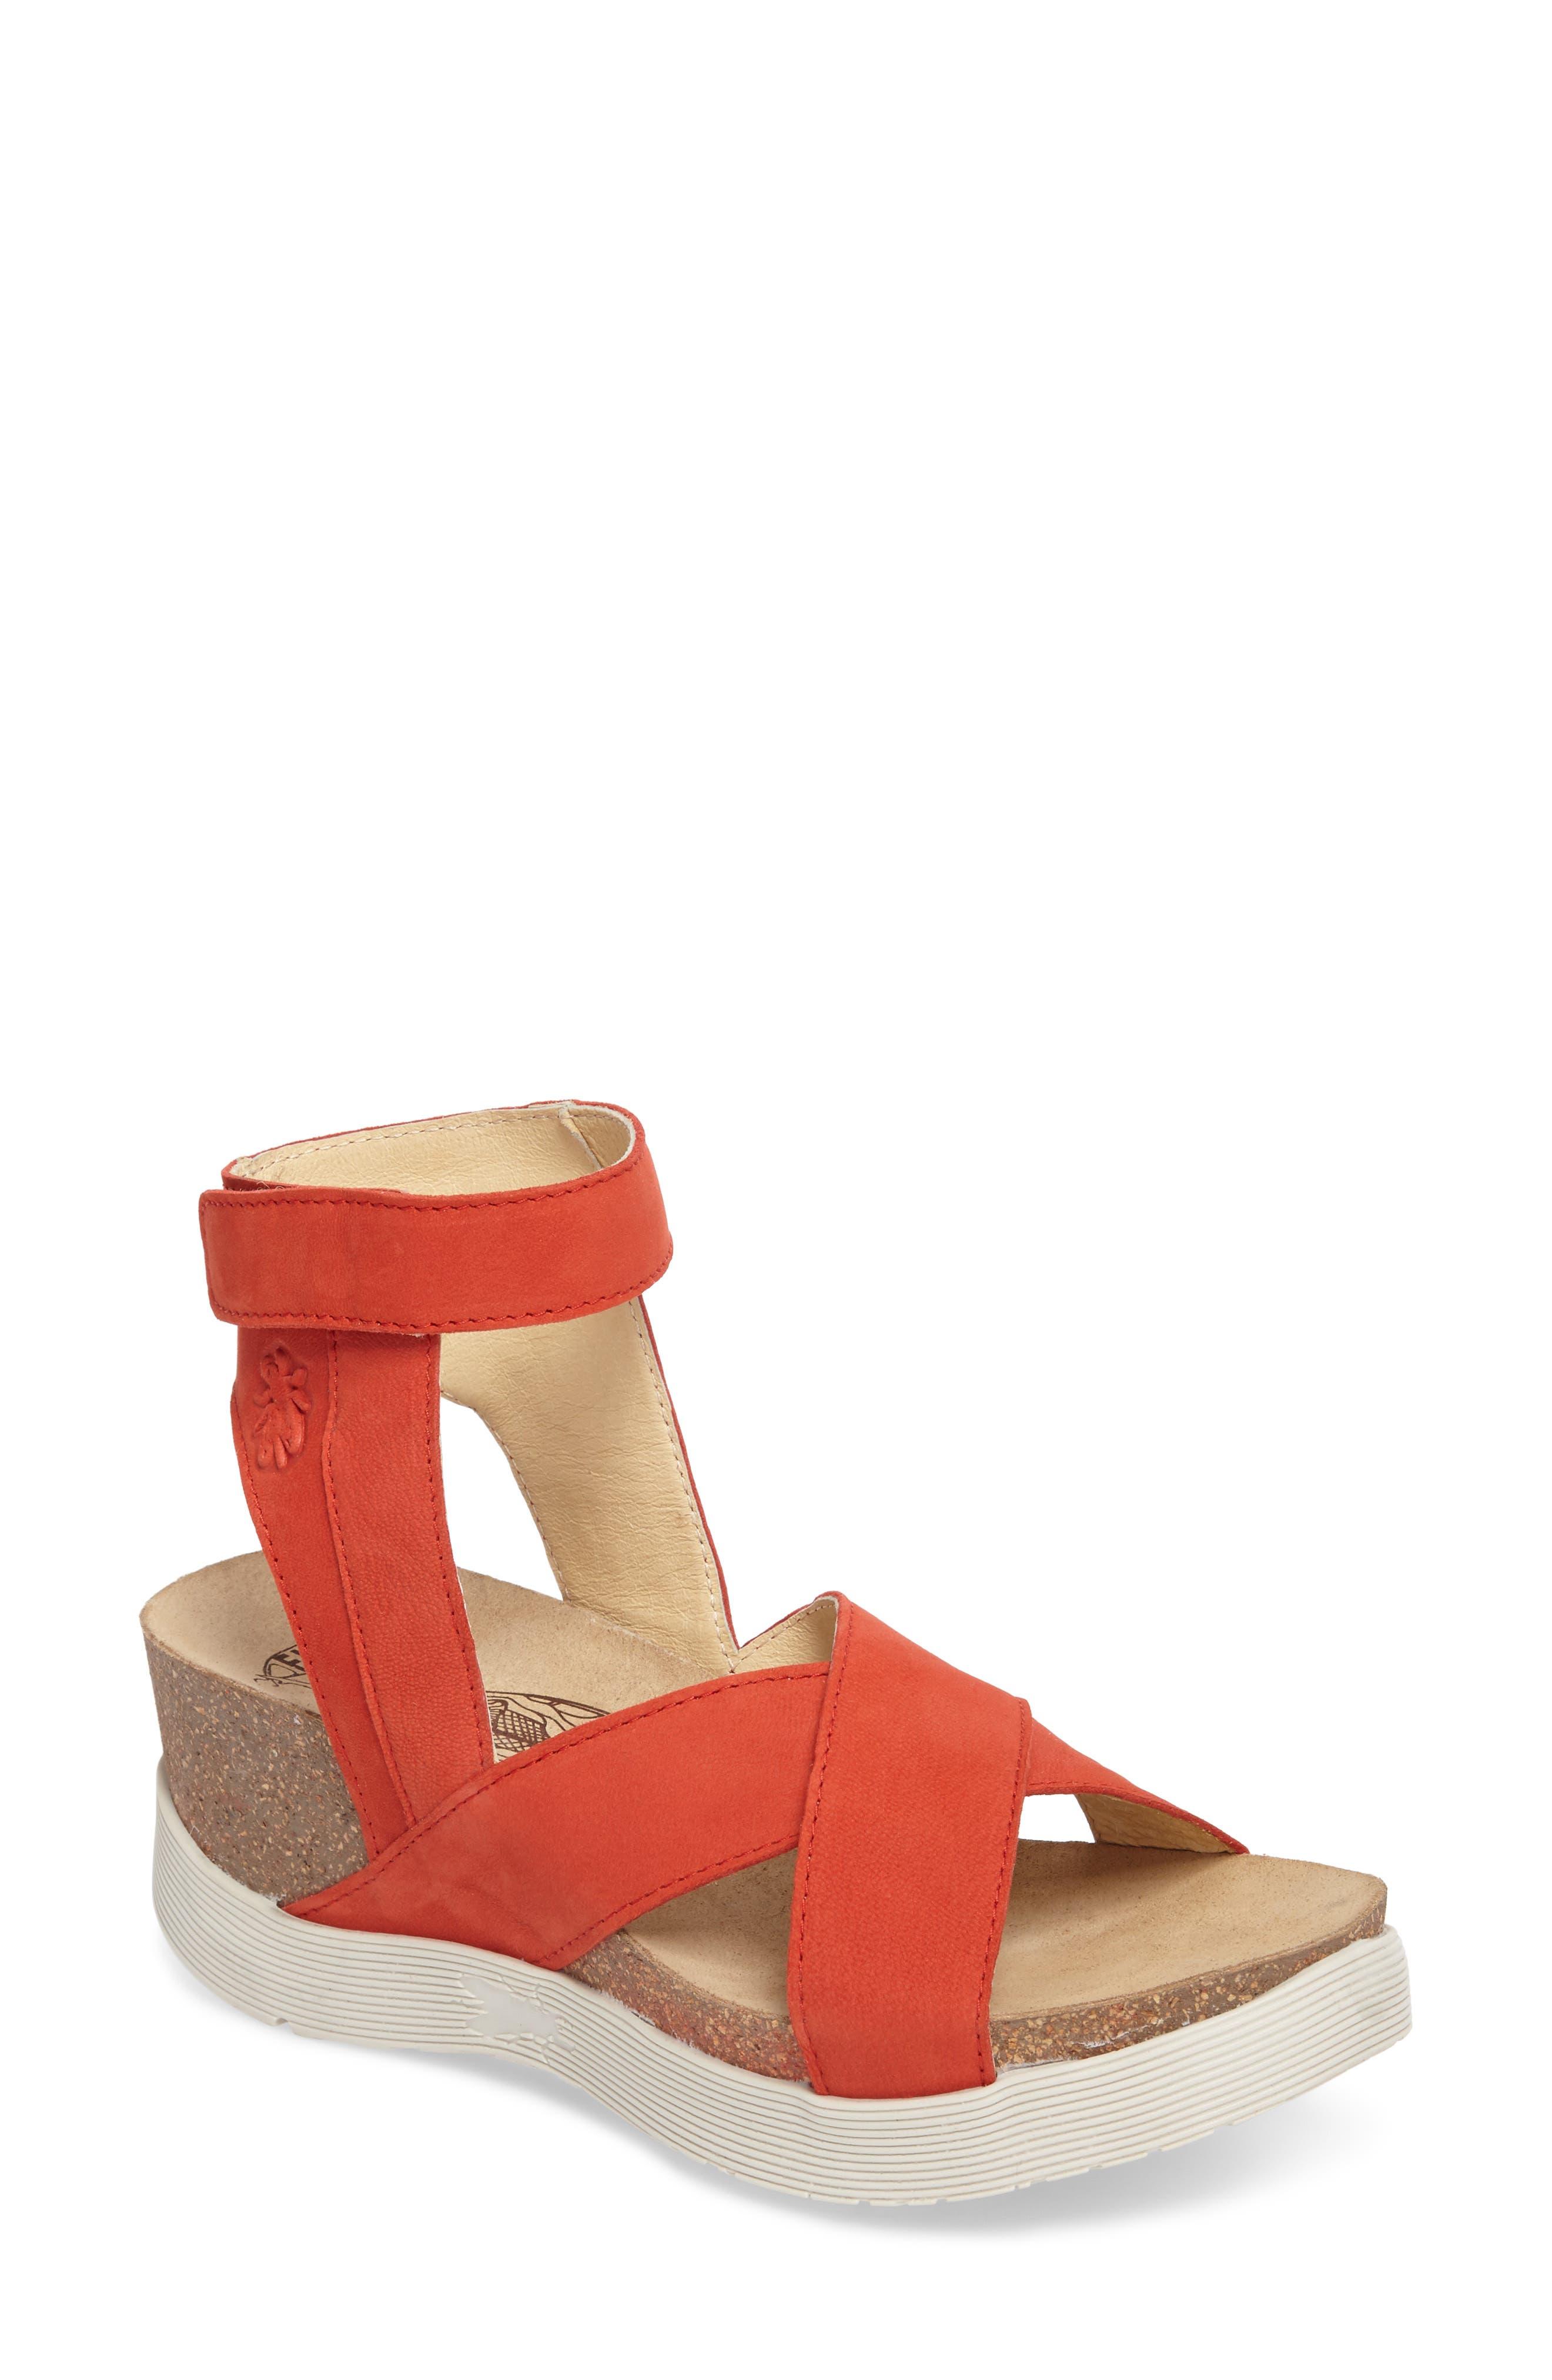 Weel Nubuck Leather Platform Sandal,                             Main thumbnail 1, color,                             Scarlet Nubuck Leather